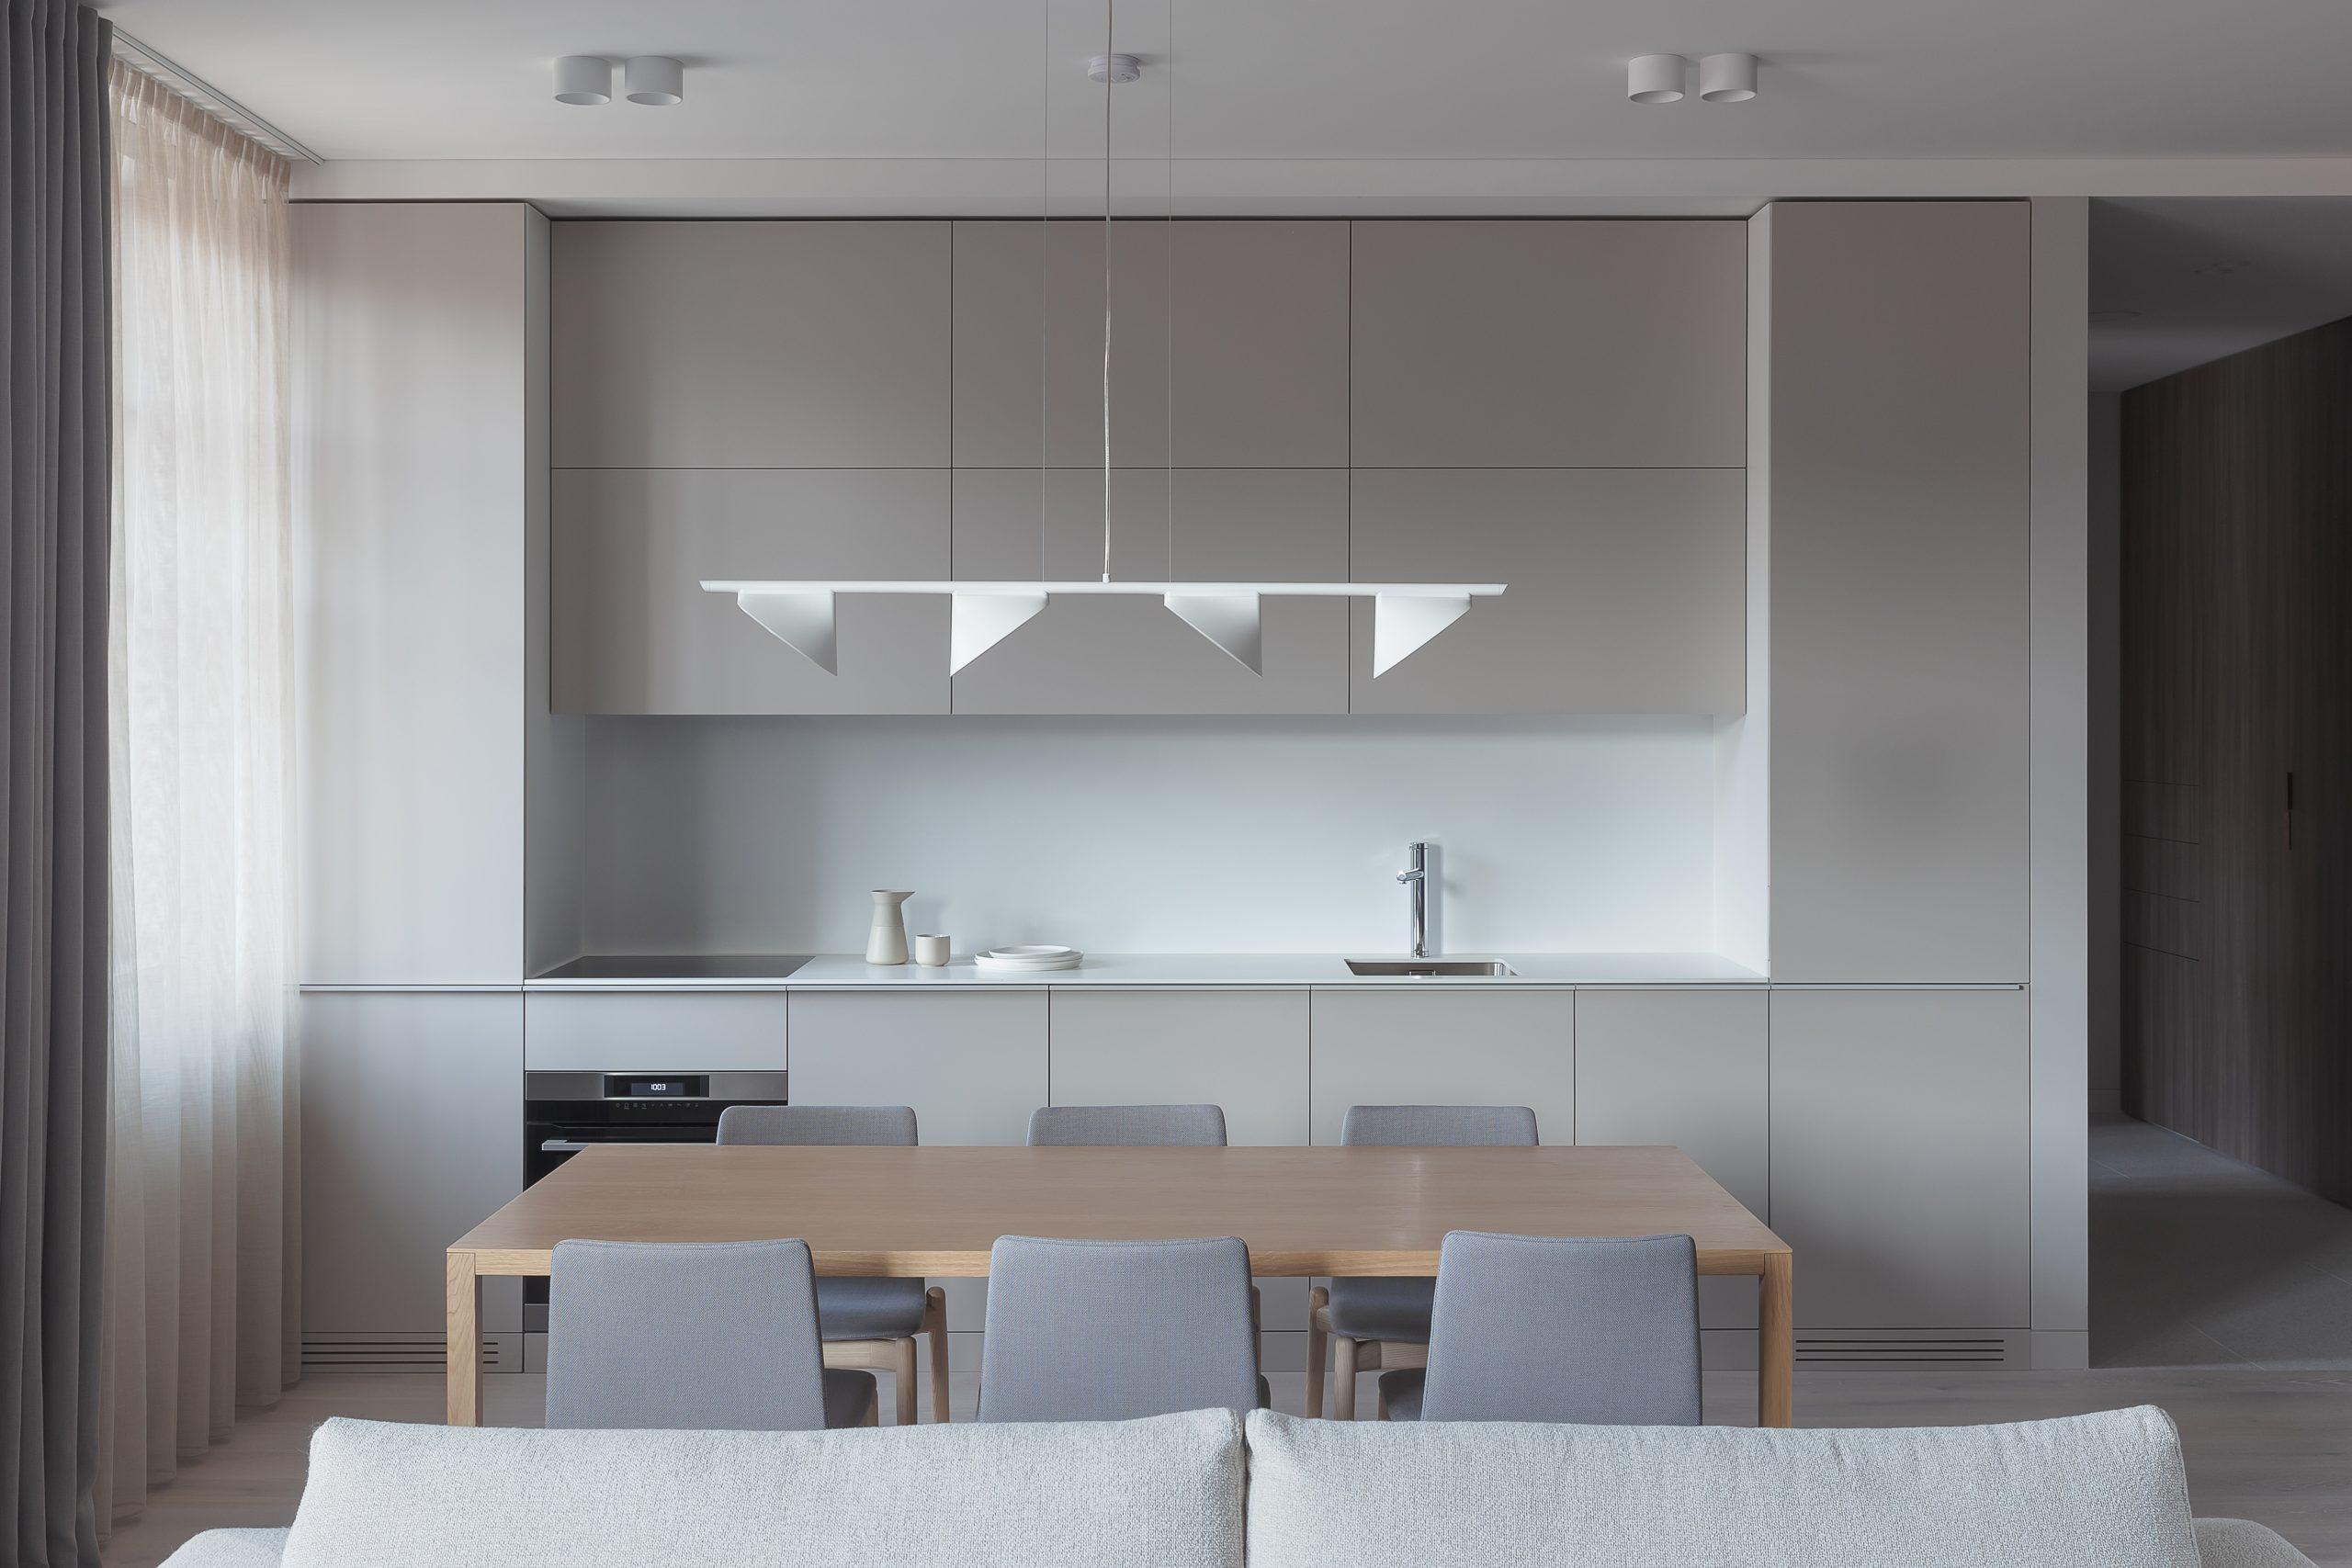 illuminazione interni casa moderna